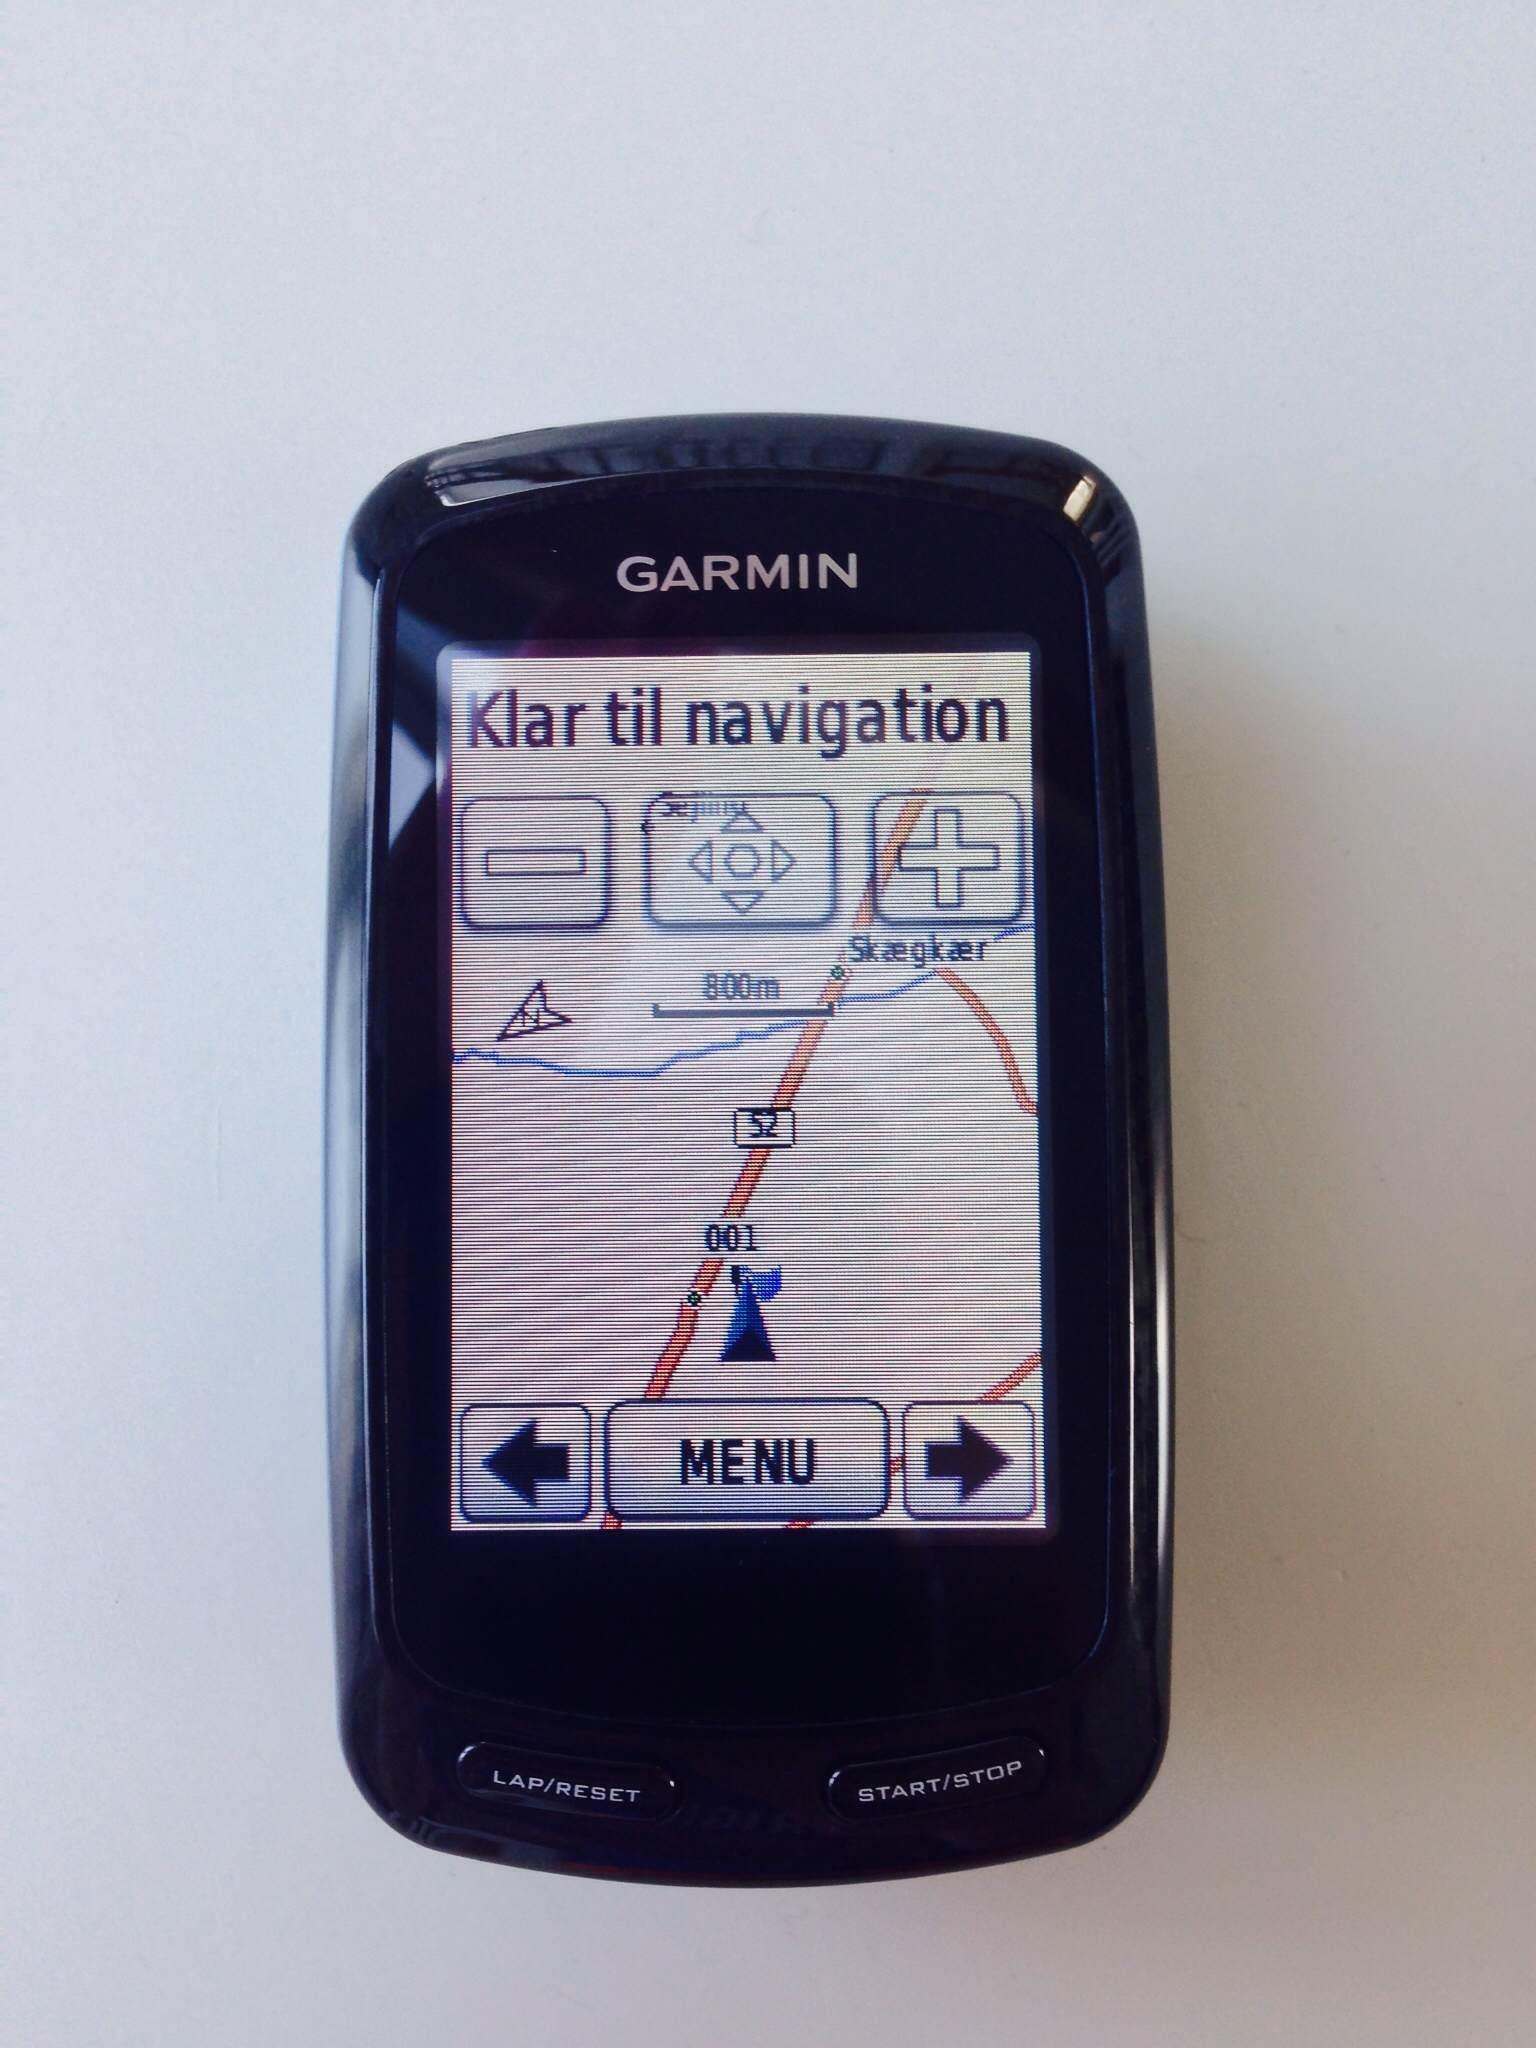 Garmin Edge 800 Test Hvor God Er Denne Cykelcomputer Fra Garmin